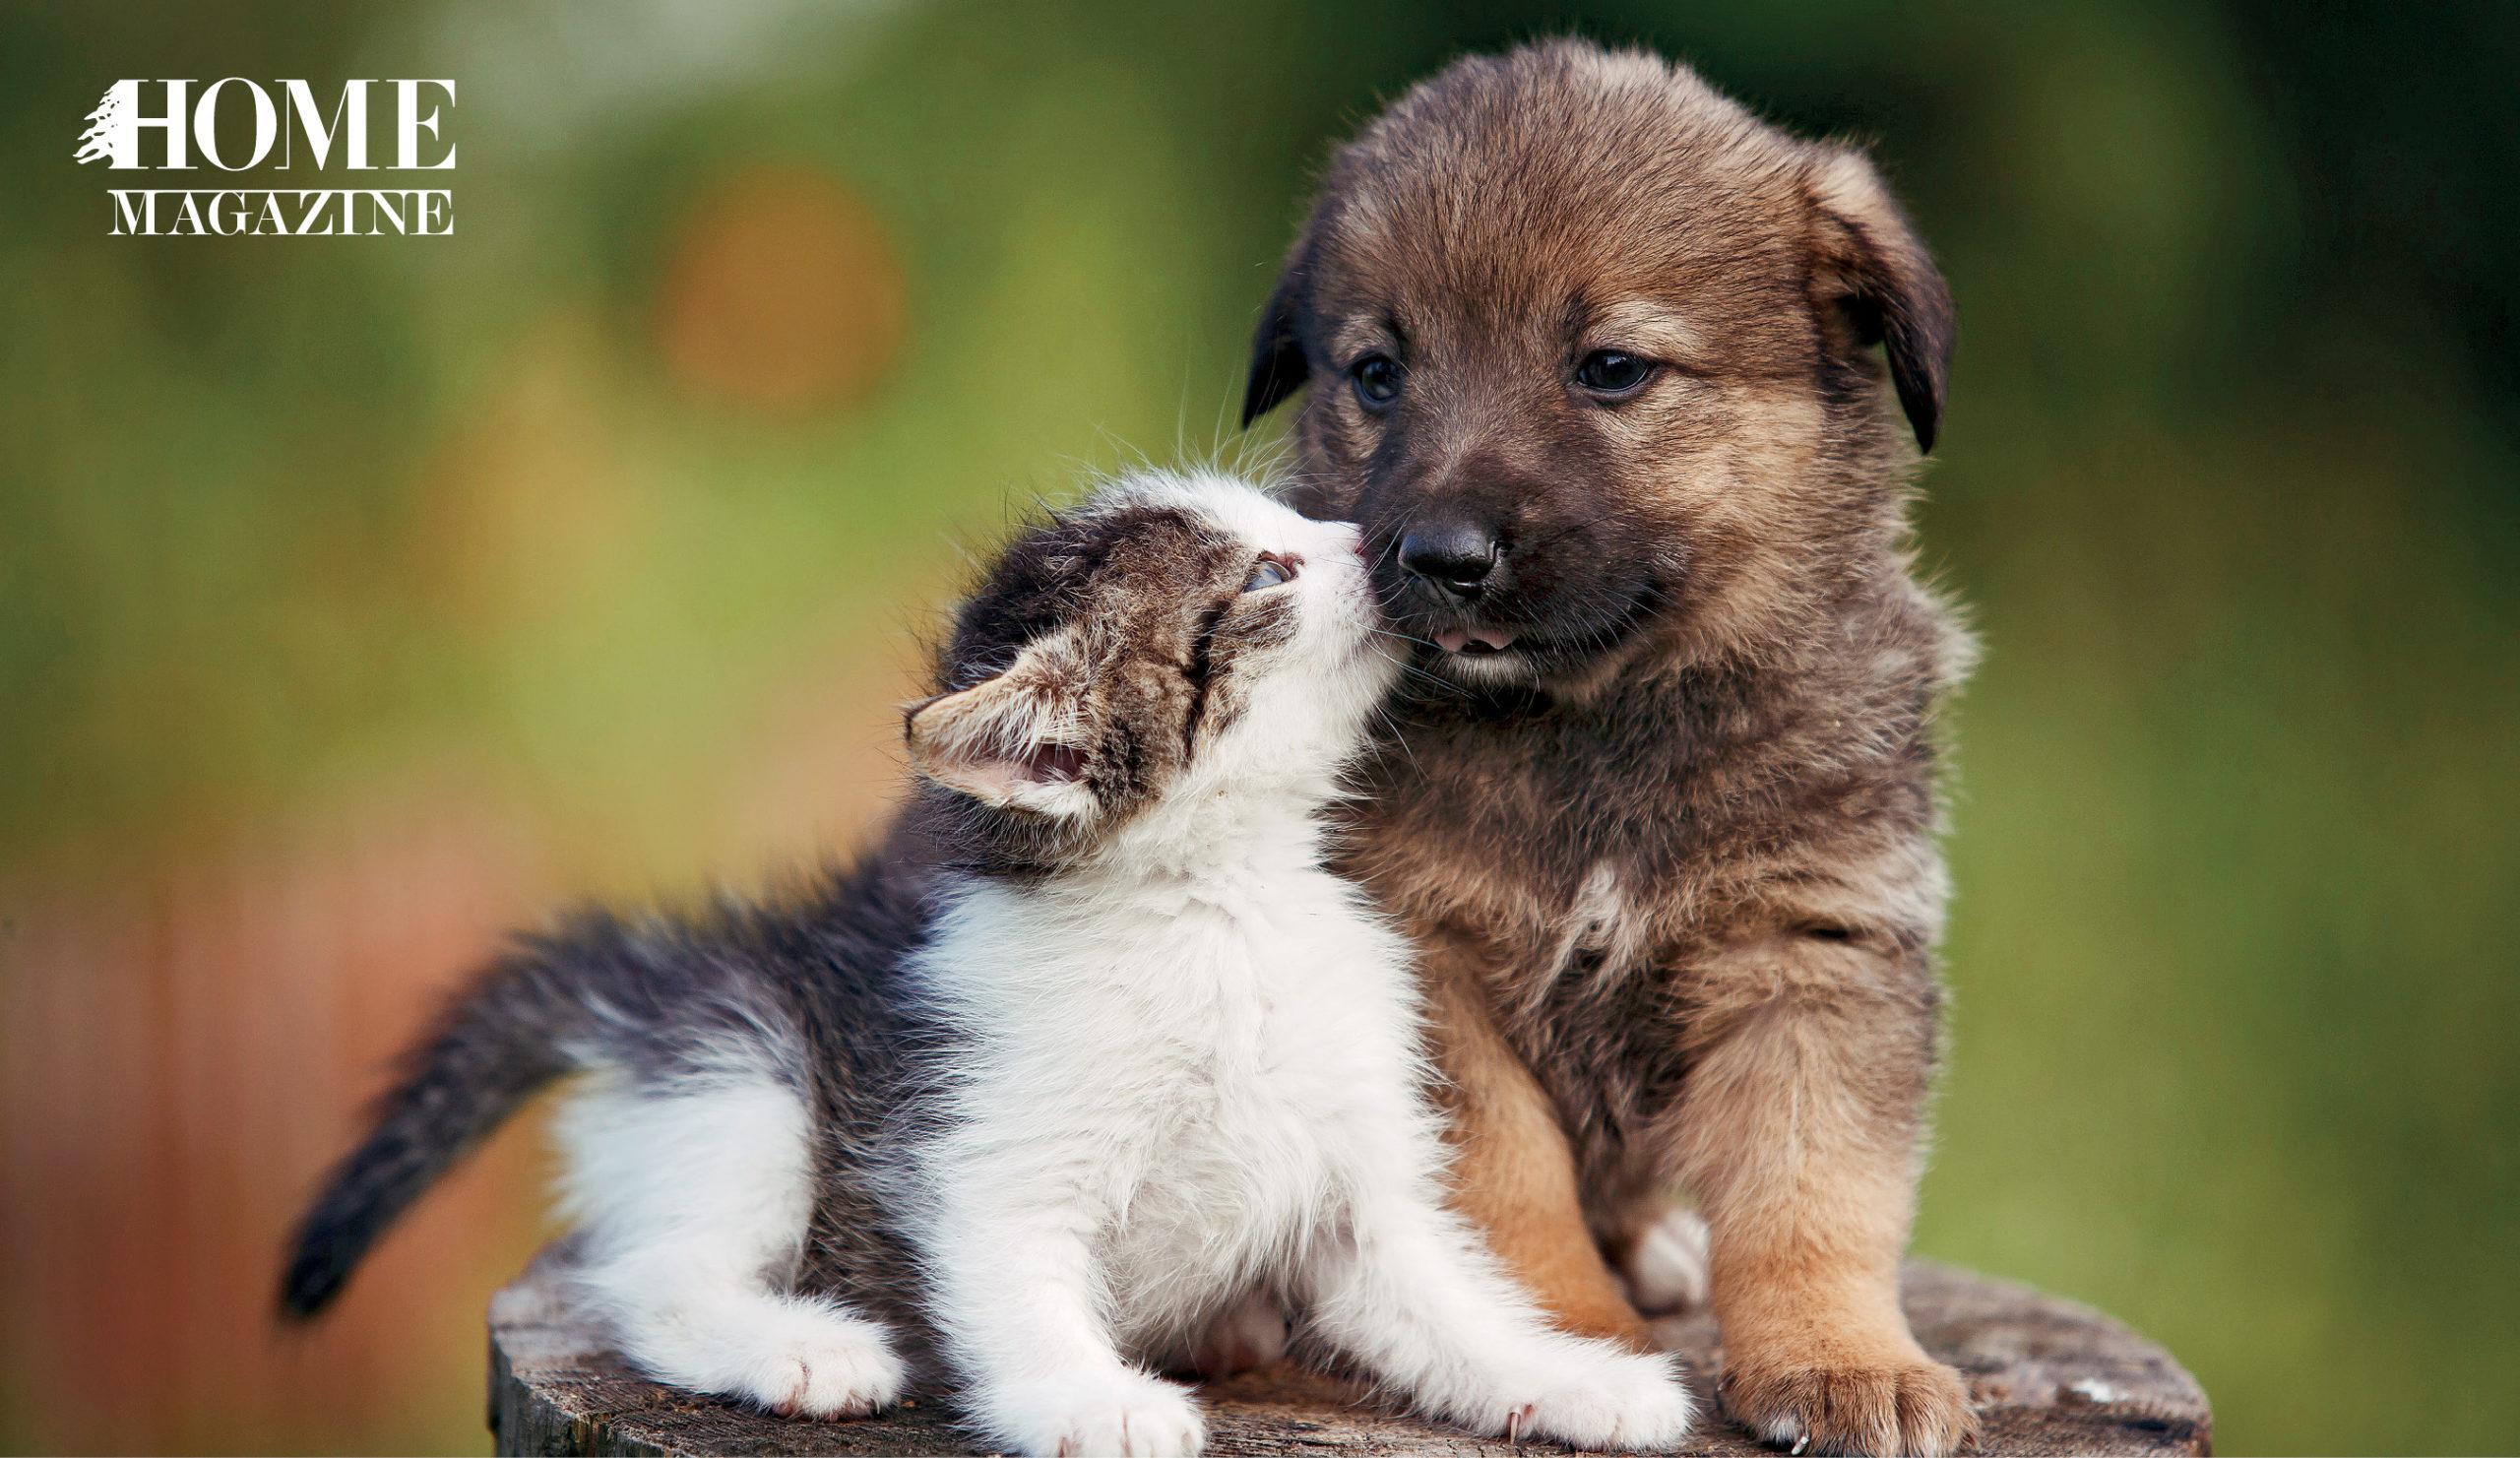 A puppy and a kitten cuddling